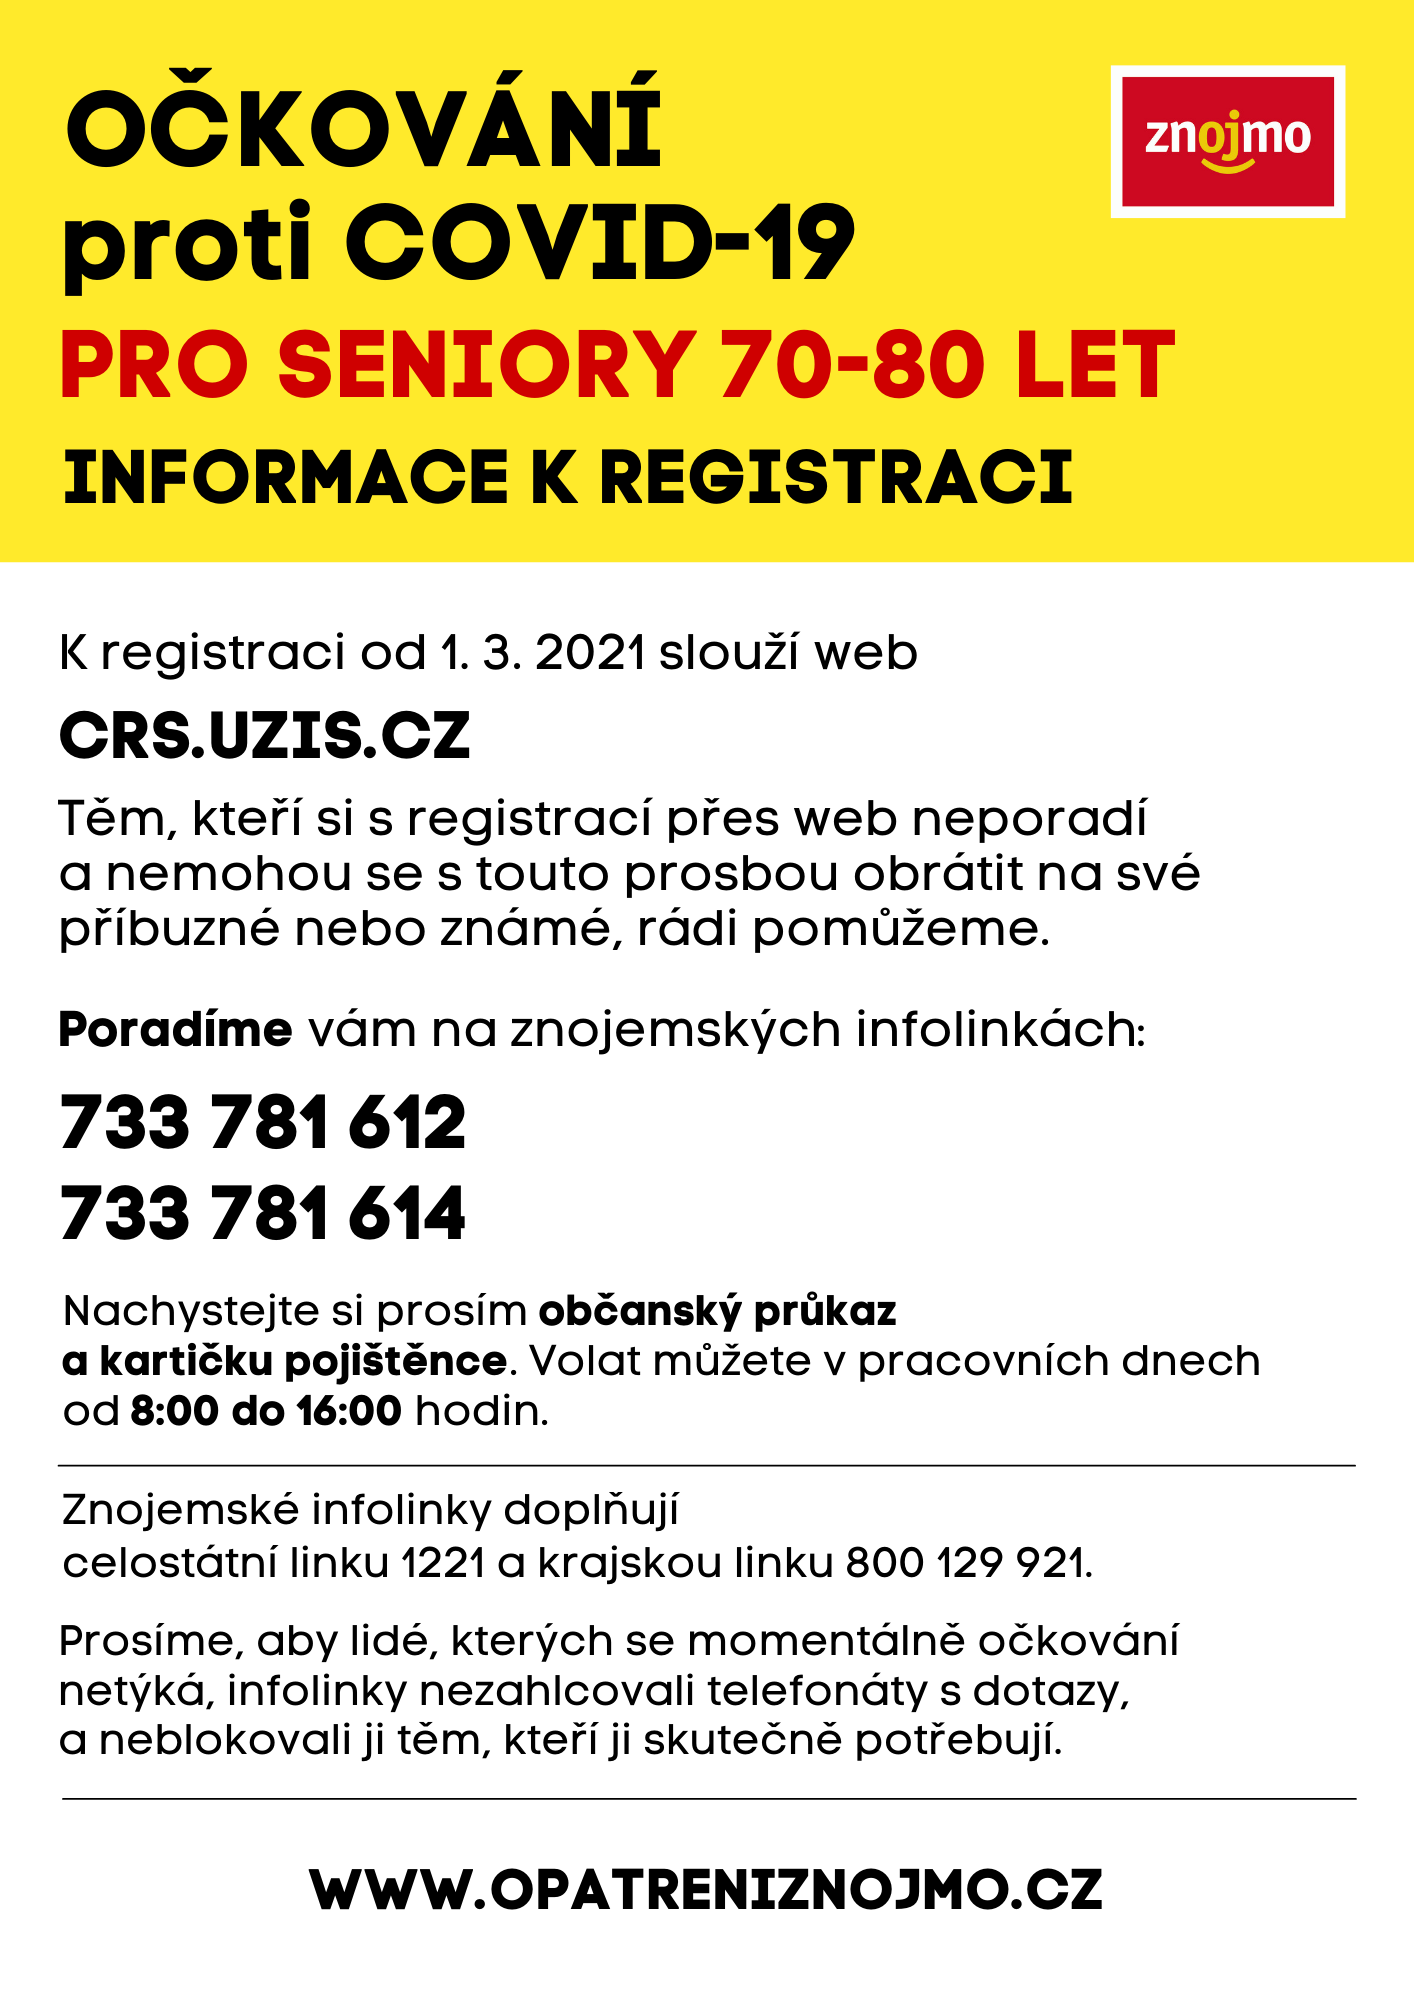 a4_ockovani_seniori_70-80_let.png